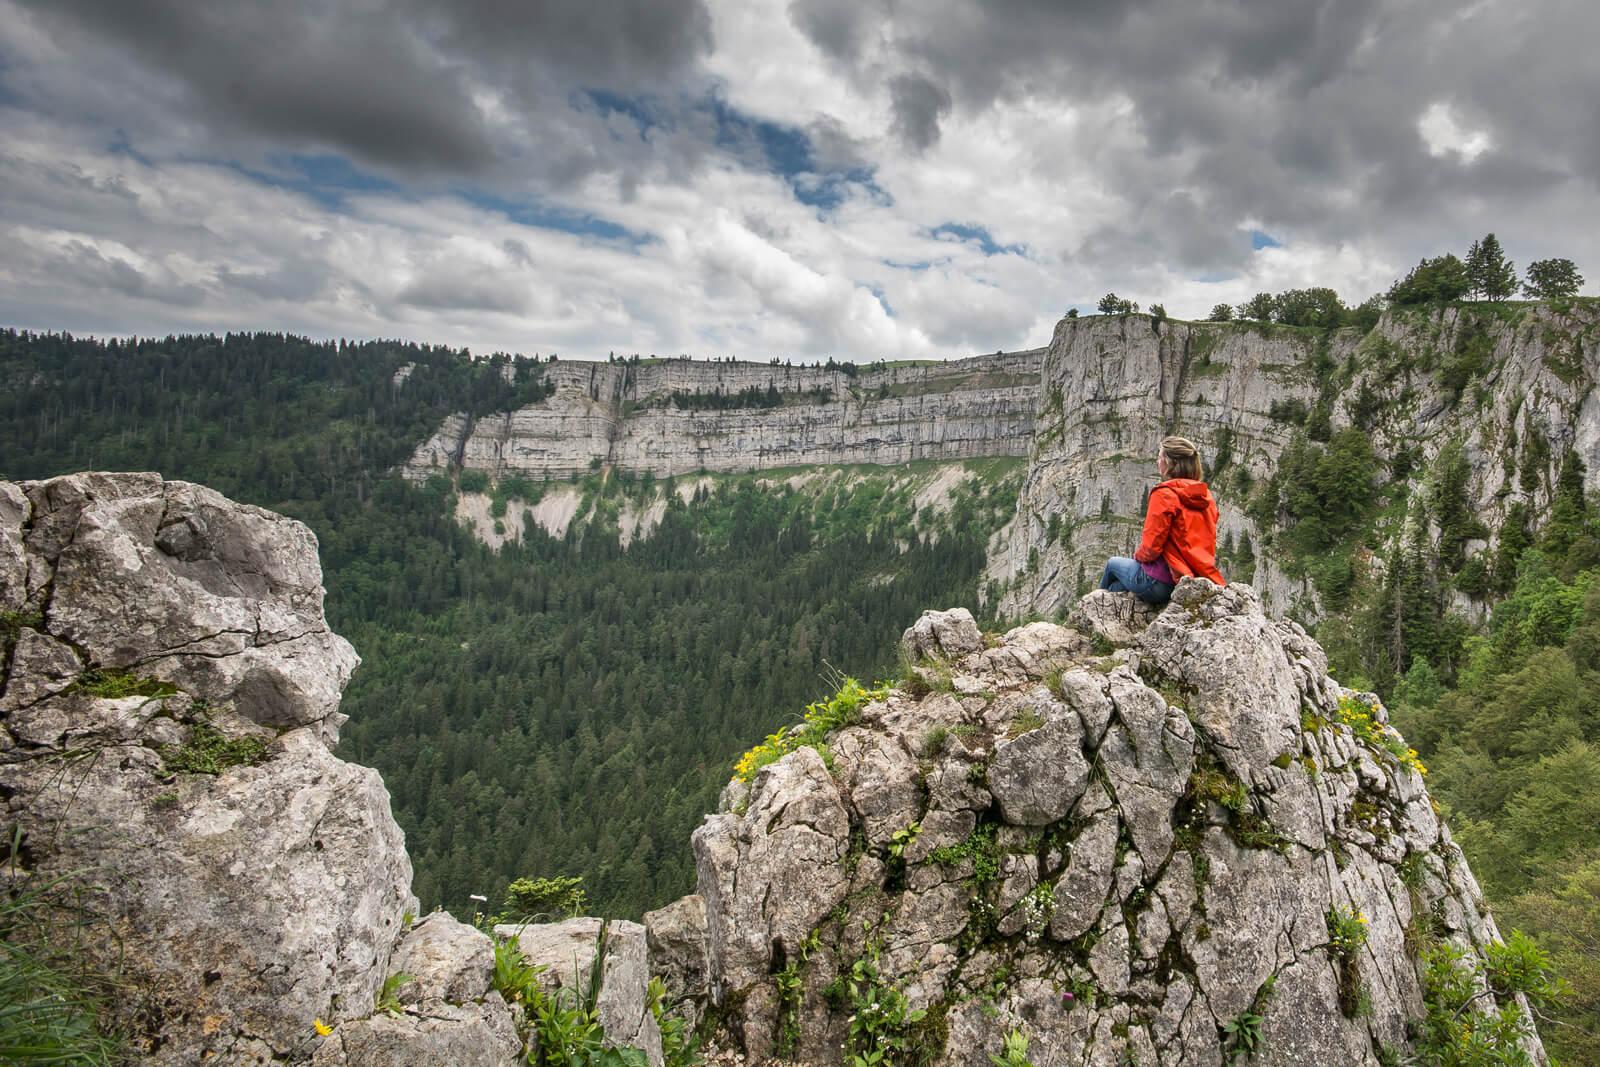 Creux du Van Rock Formations in Neuchâtel